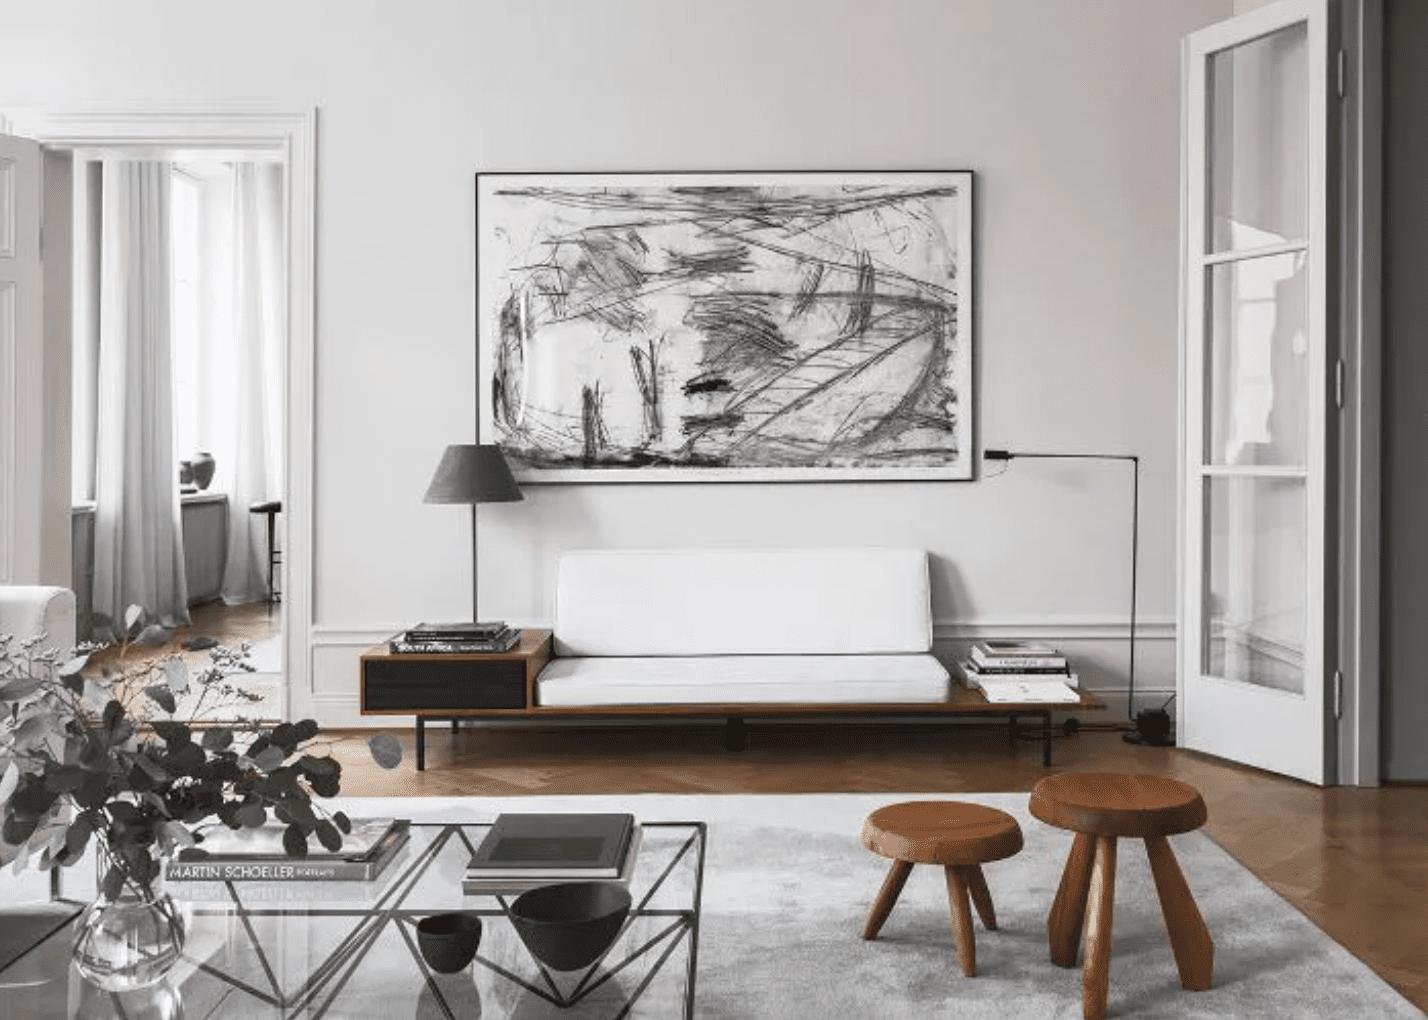 Liljencrantz Design